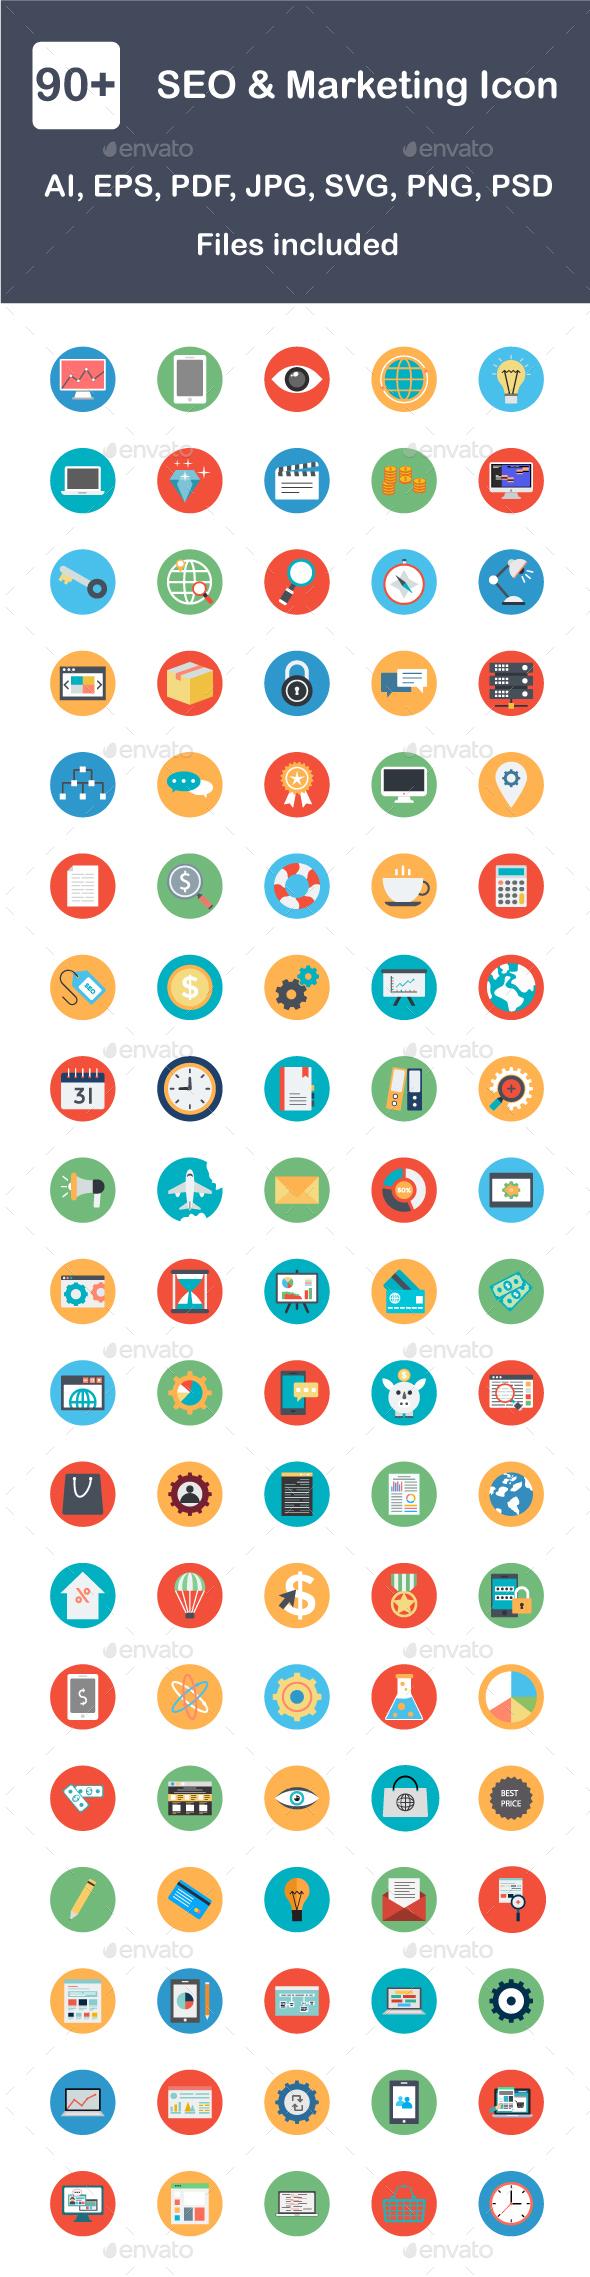 Seo & Marketing - Web Icons